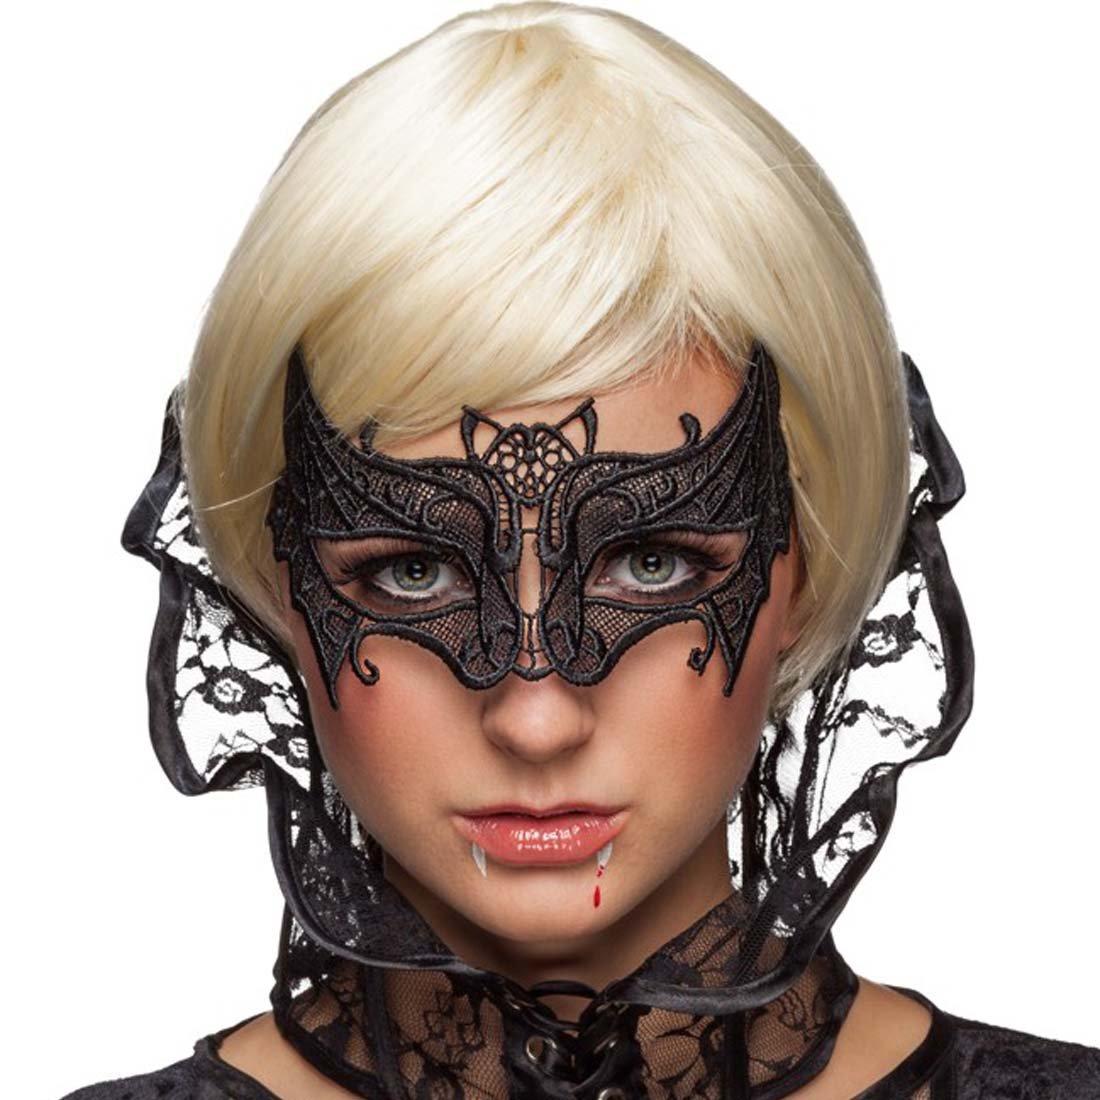 Venezianische Fledermausmaske Augenmaske Vampir Gothic Maske Maskenball Spitzenmaske Fledermaus Vampirkostüm Ballmaske Fledermauskostüm Zubehör NET TOYS